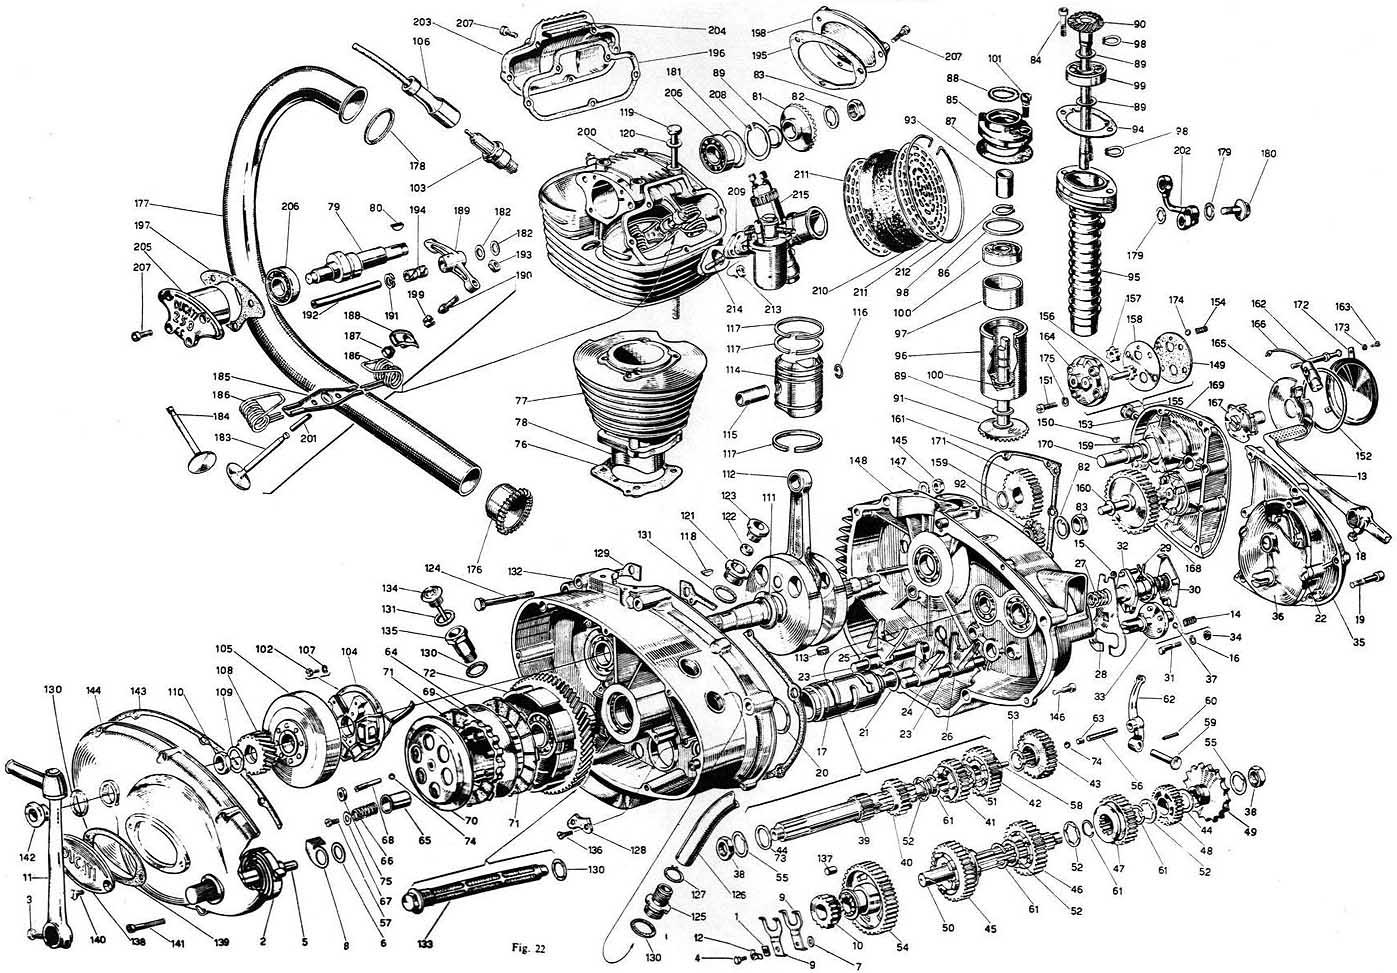 Fantastic Deere Gator 6x4 Wiring Diagram Image - Wiring Diagram ...